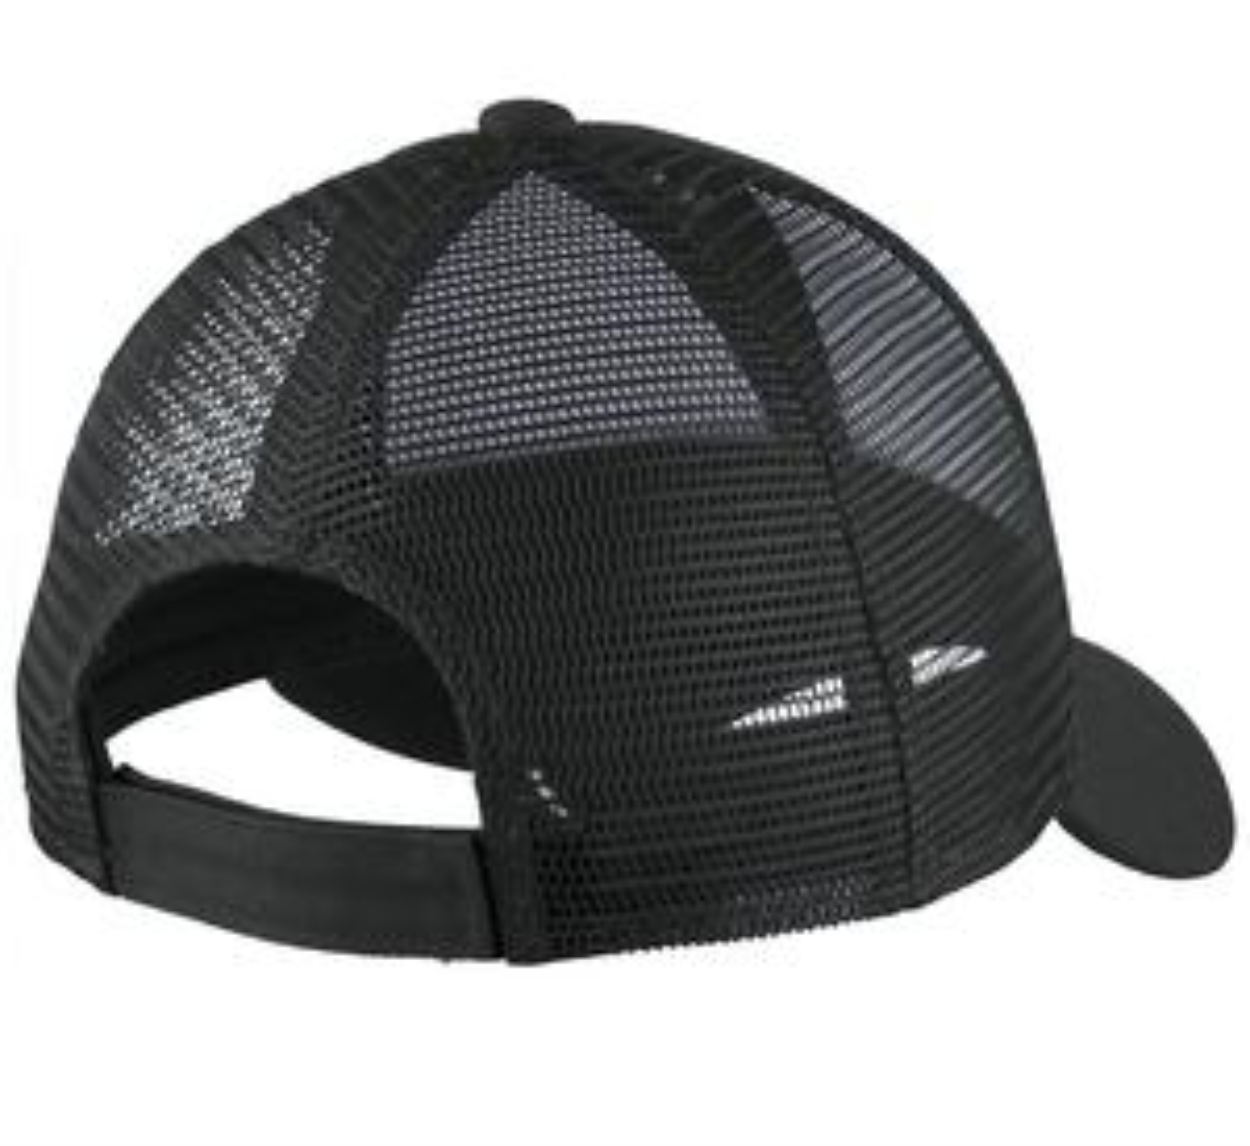 Port Authority Mesh Back Cap – Two Socks Designs d6ef6205a7d